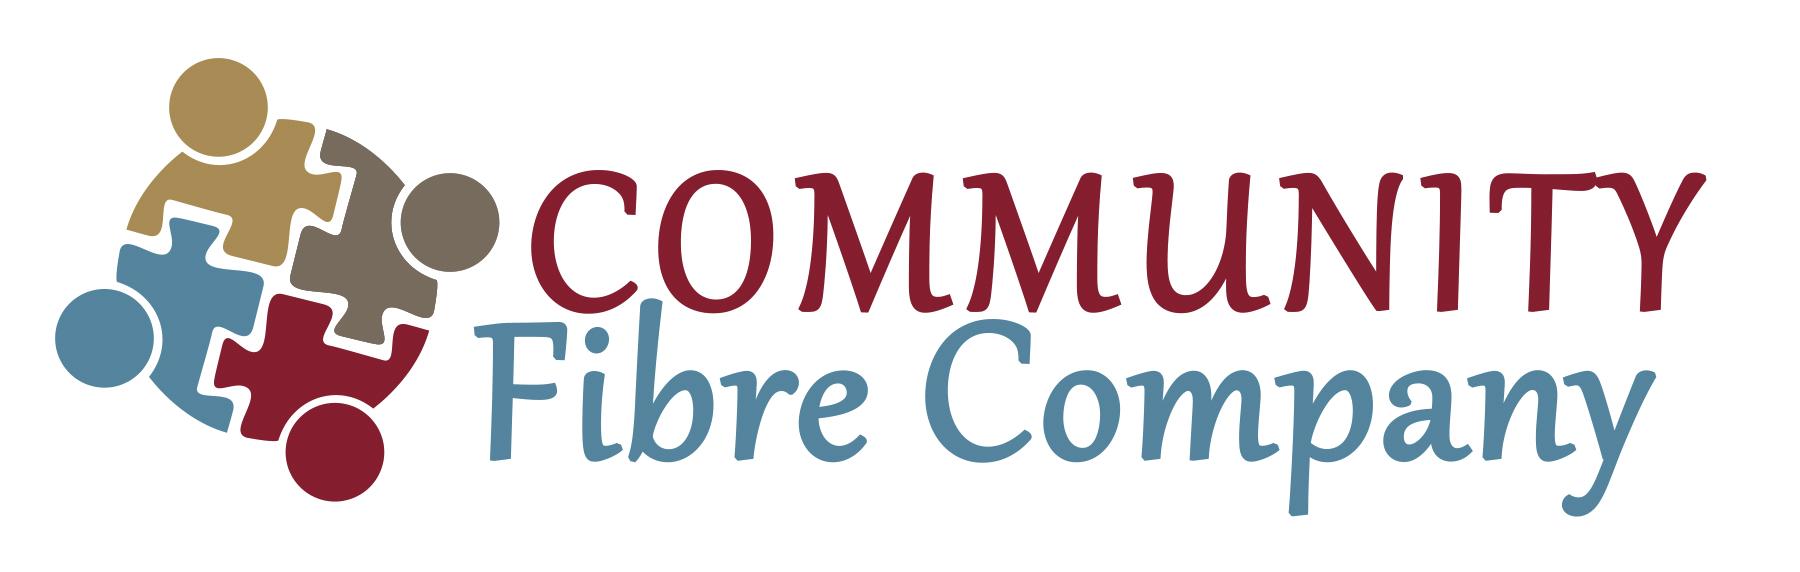 Community Fibre Company